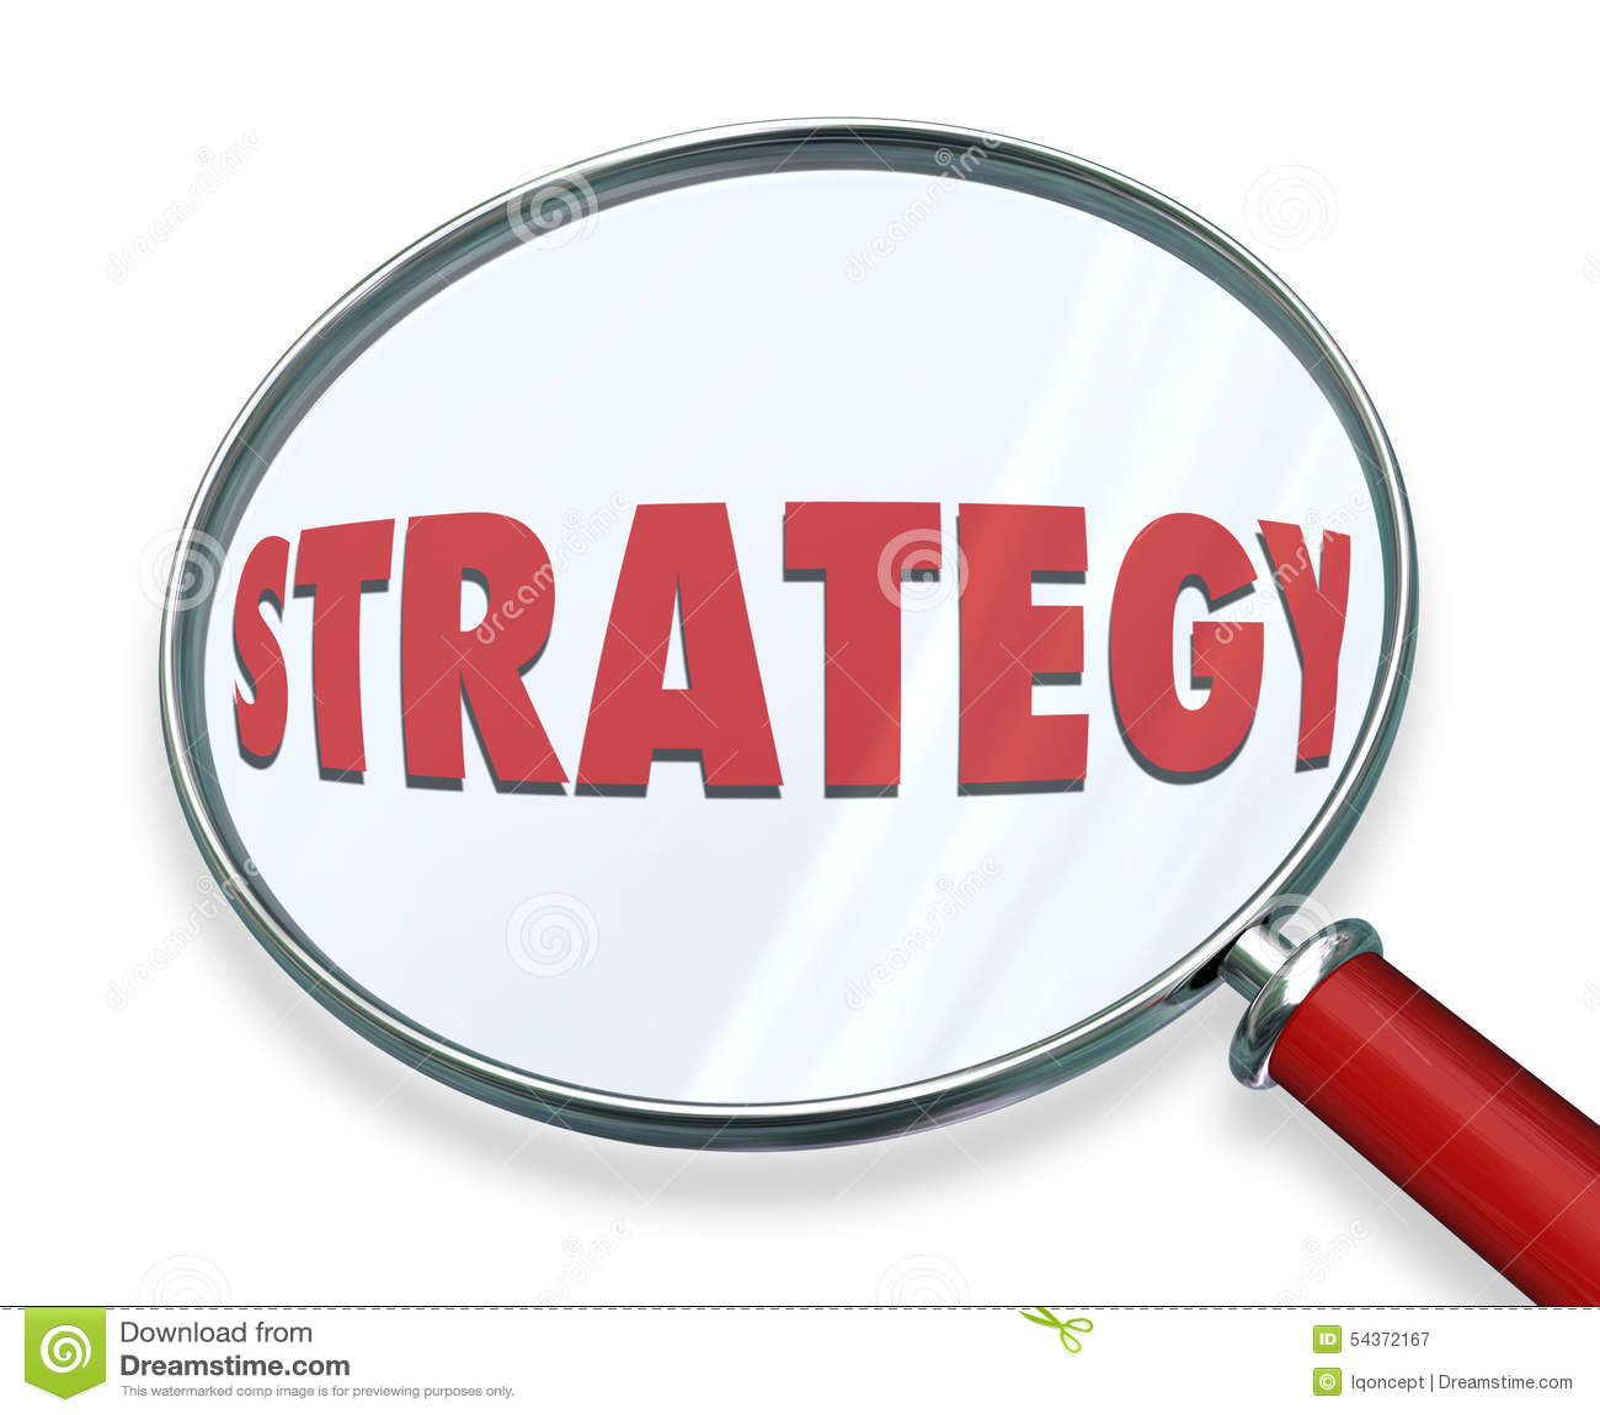 Strategic Planning Process: Evaluate Your Strategic Plan